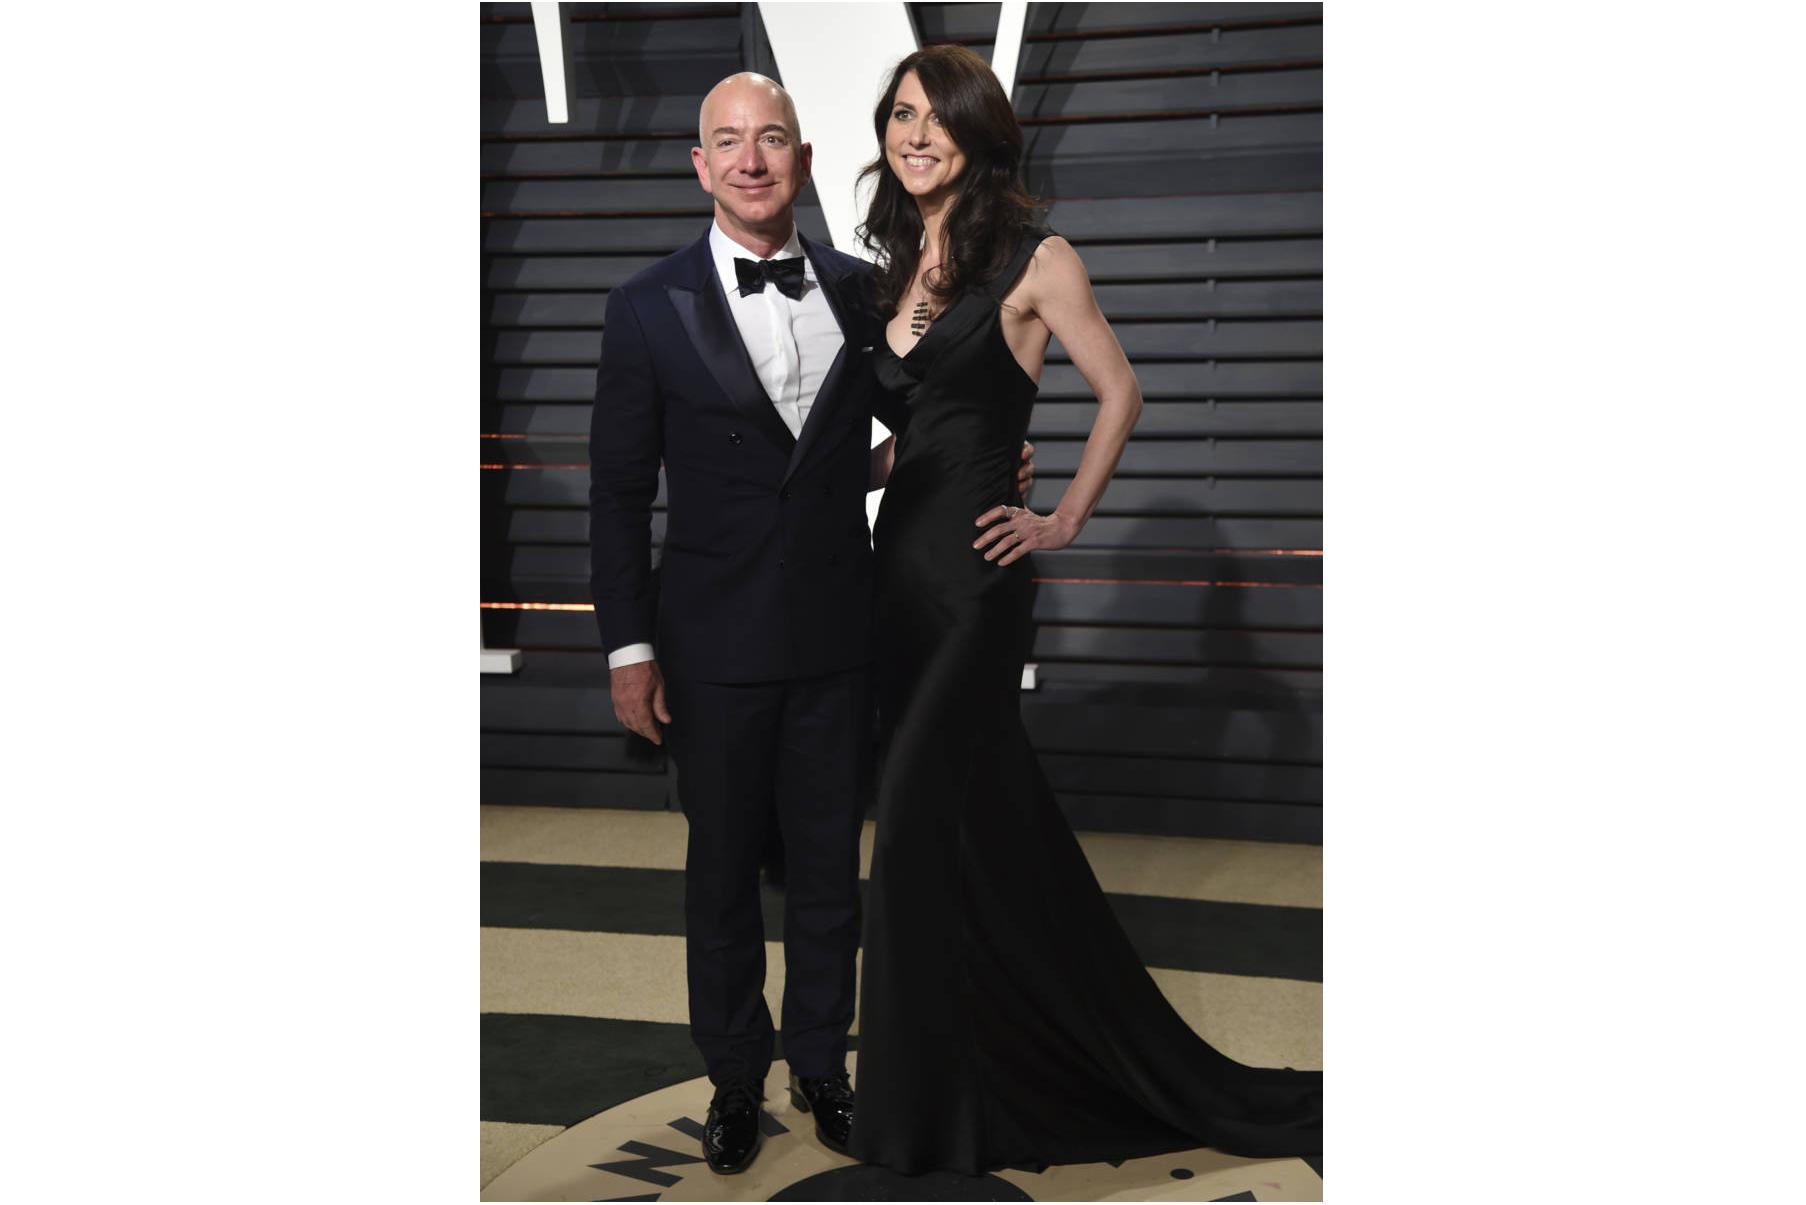 Limbajul nonverbal în cuplu – Jeff și MacKenzie Bezos